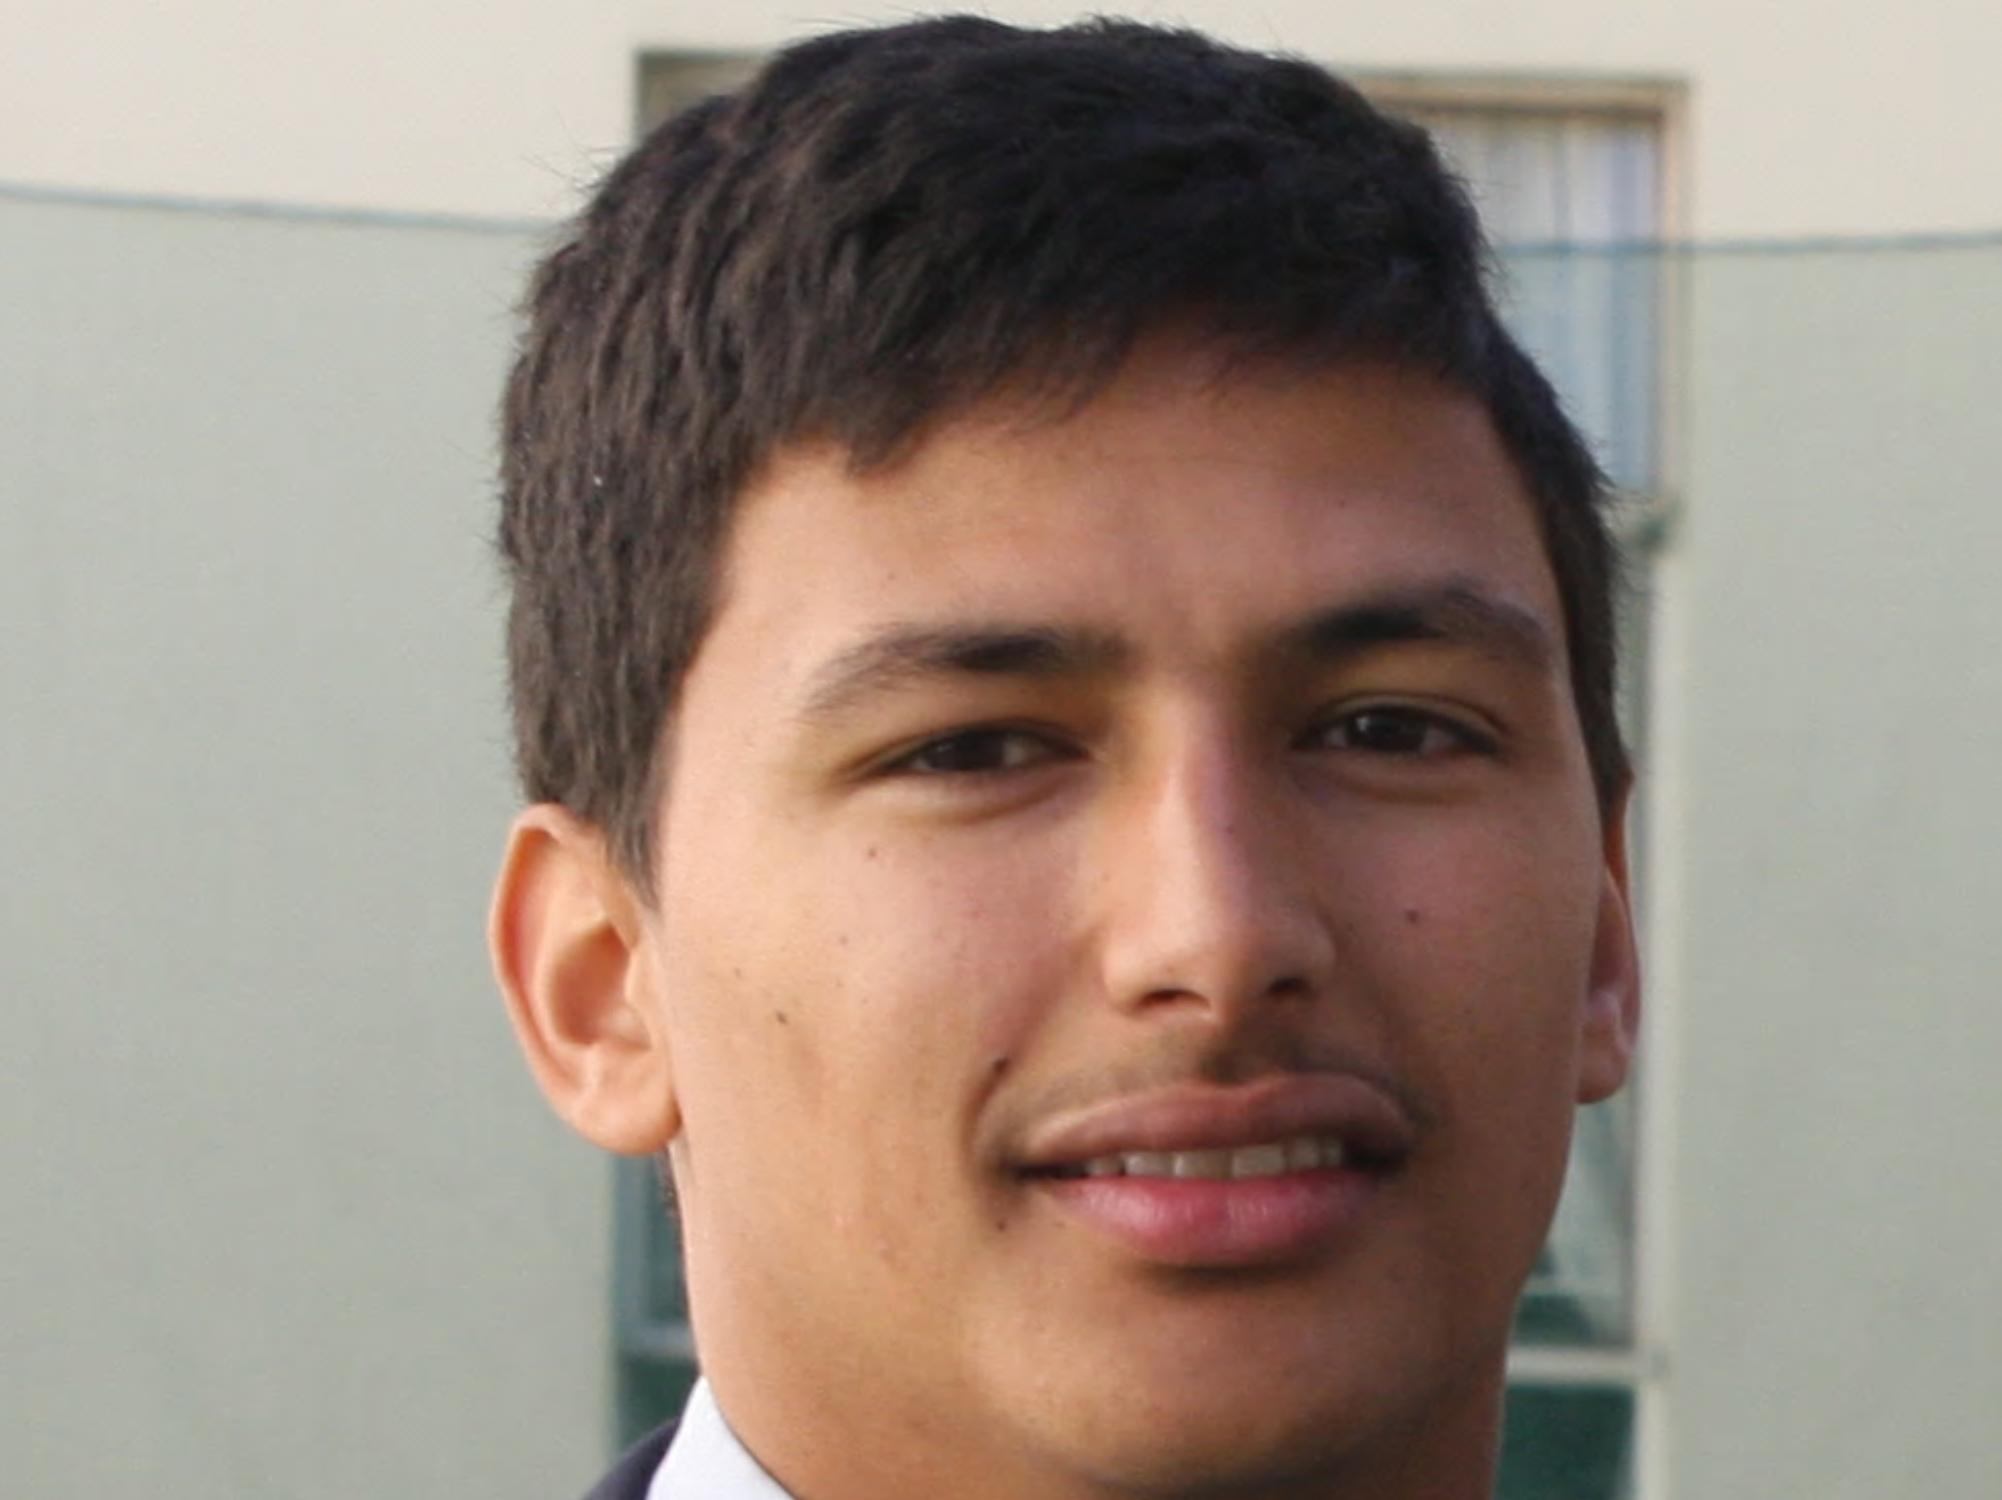 Majuba Stellenbosch Head Boy York High